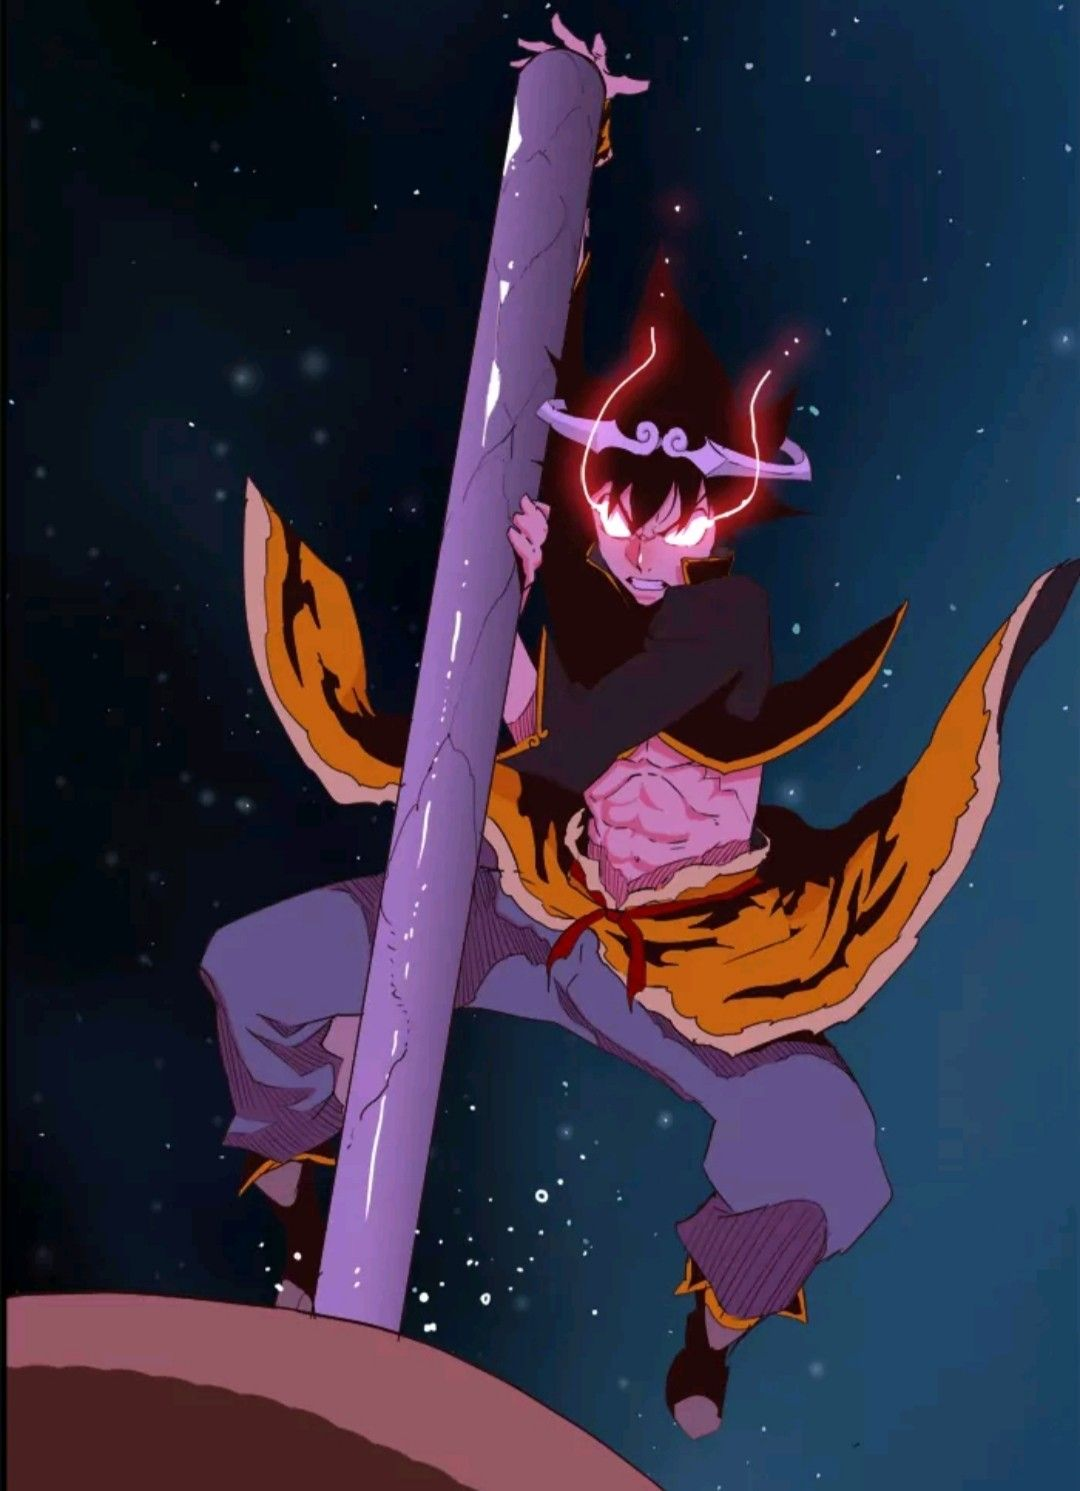 Pin by Ali on God Of High School Anime, Monkey king